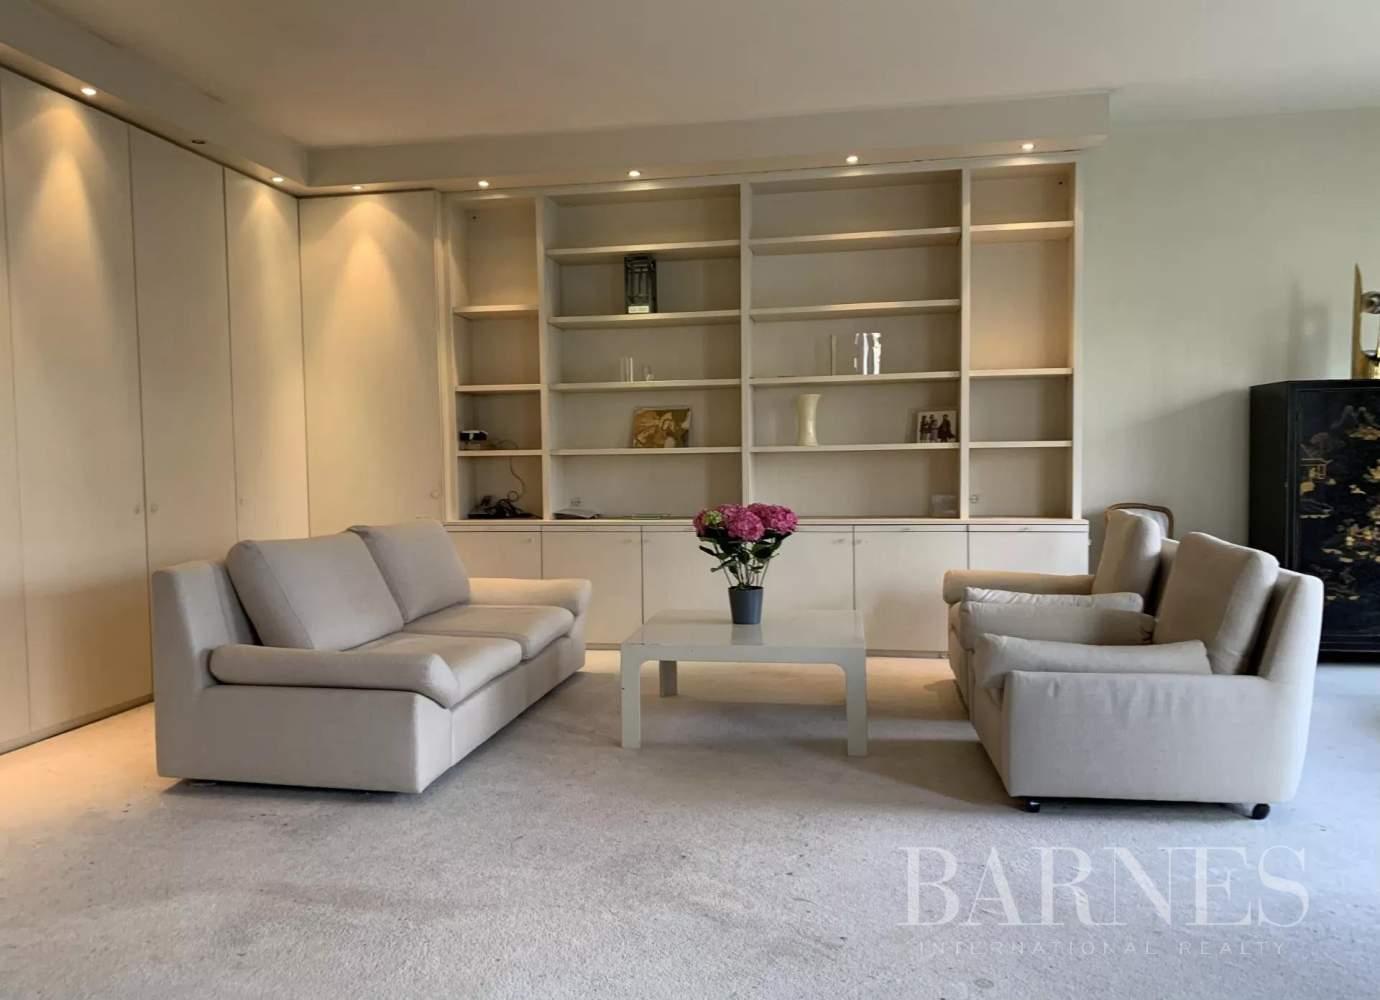 Neuilly-sur-Seine  - Appartement 4 Pièces 3 Chambres - picture 1